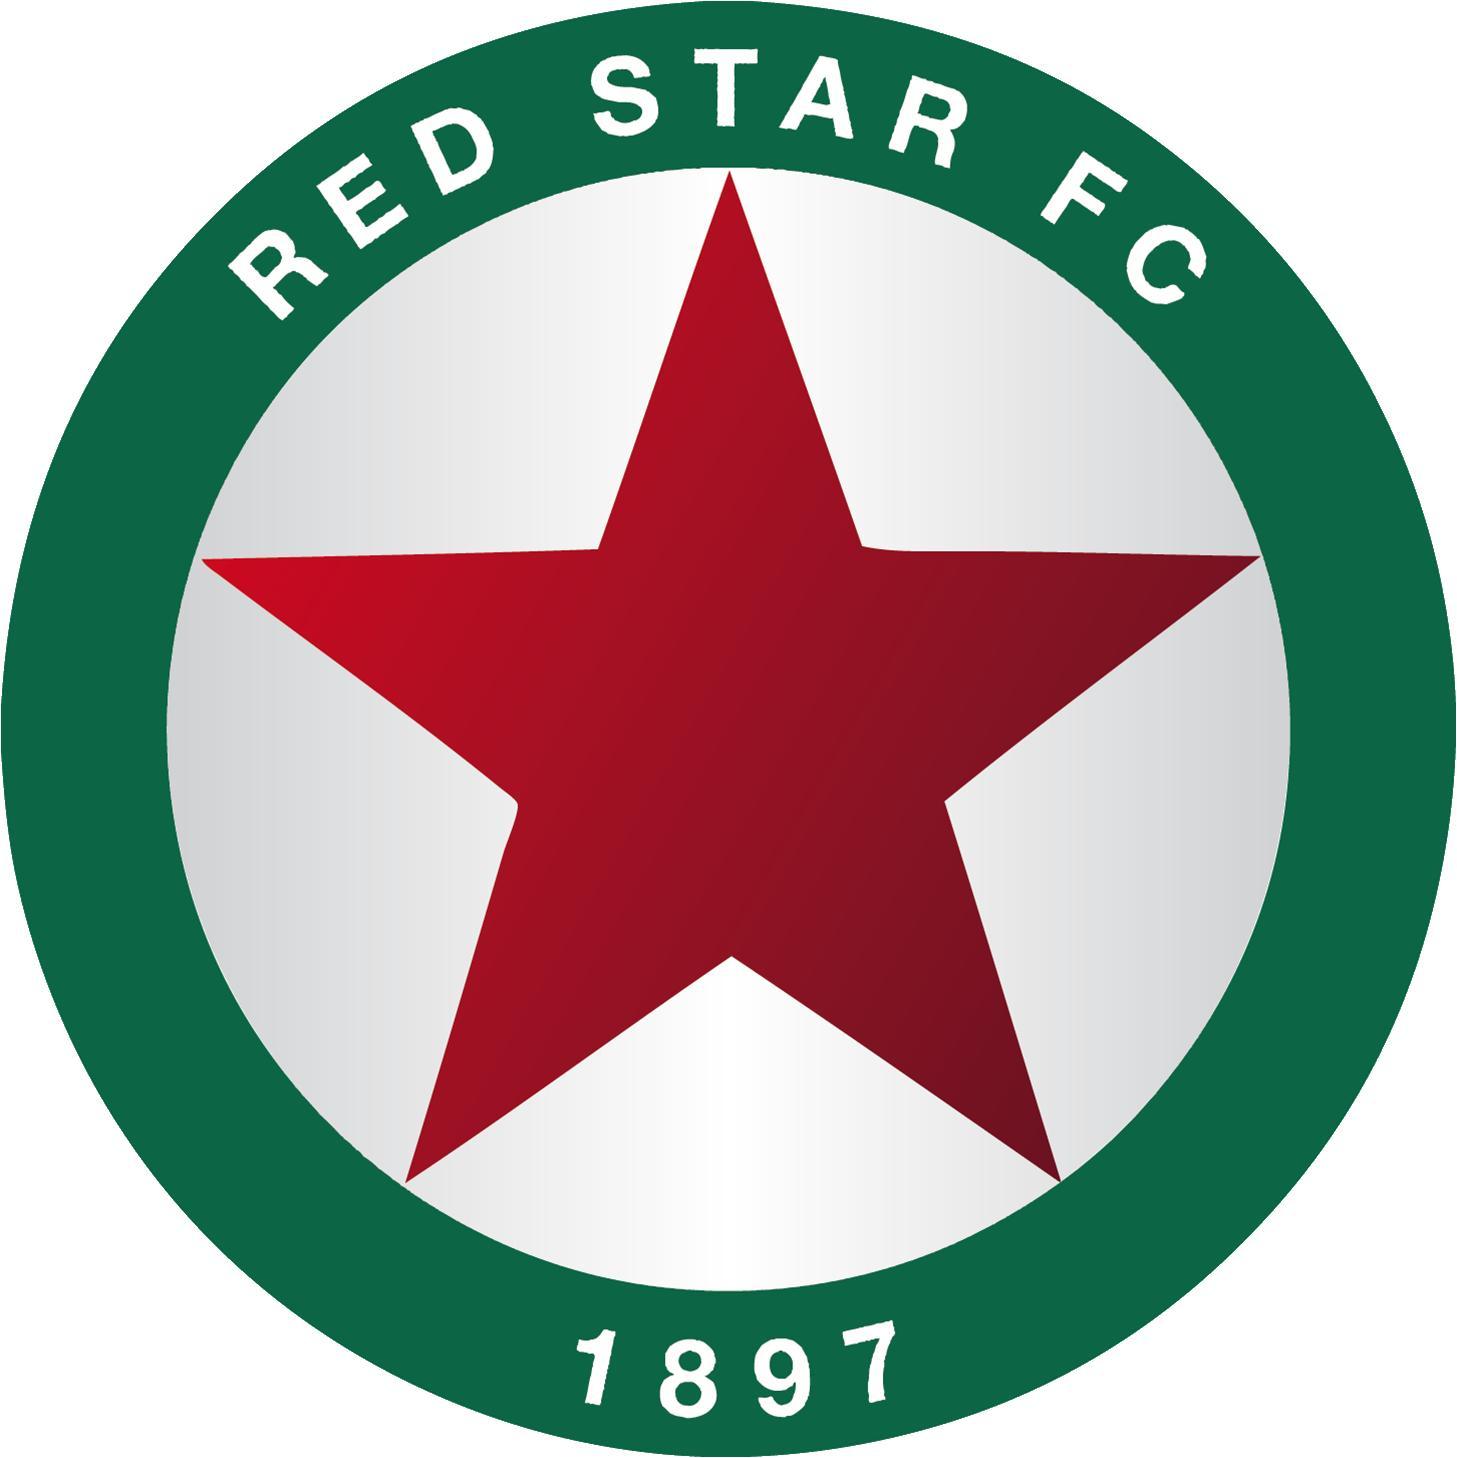 Matchs de football du Red Star (ligue 2) au Stade Jean Bouin de Paris